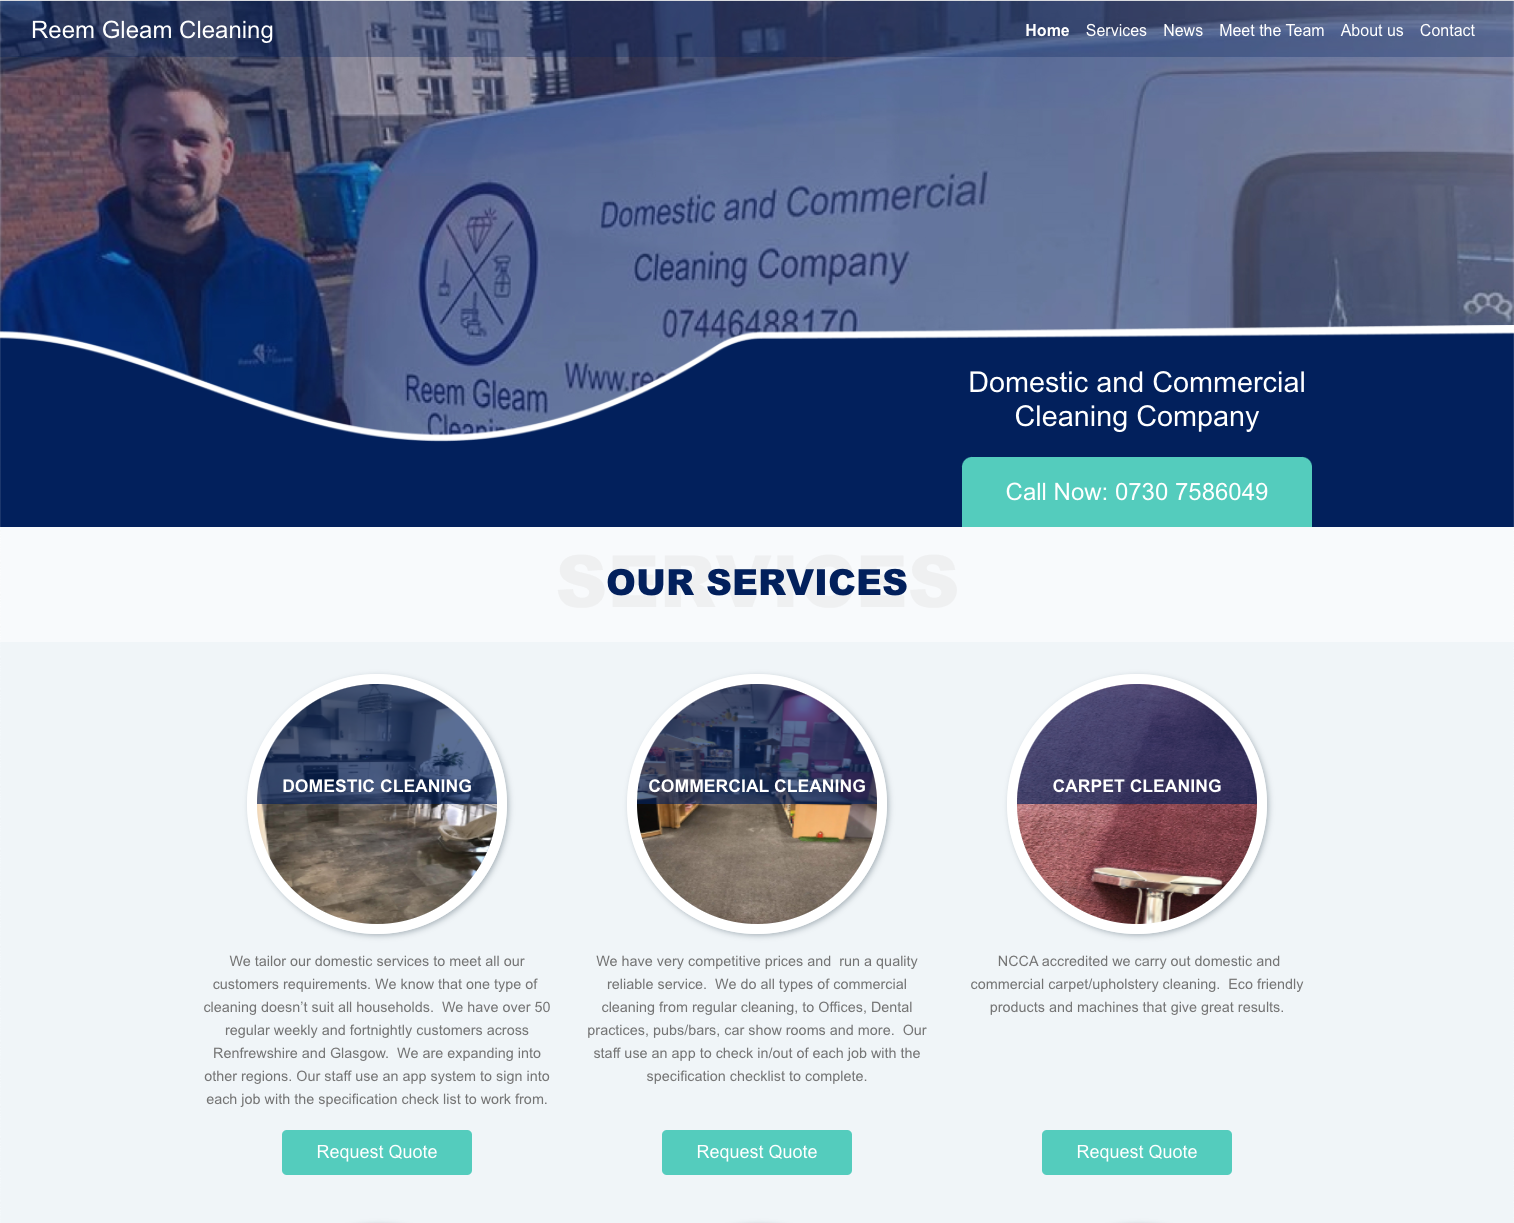 Web Design Kent | reemgleamcleaning.com